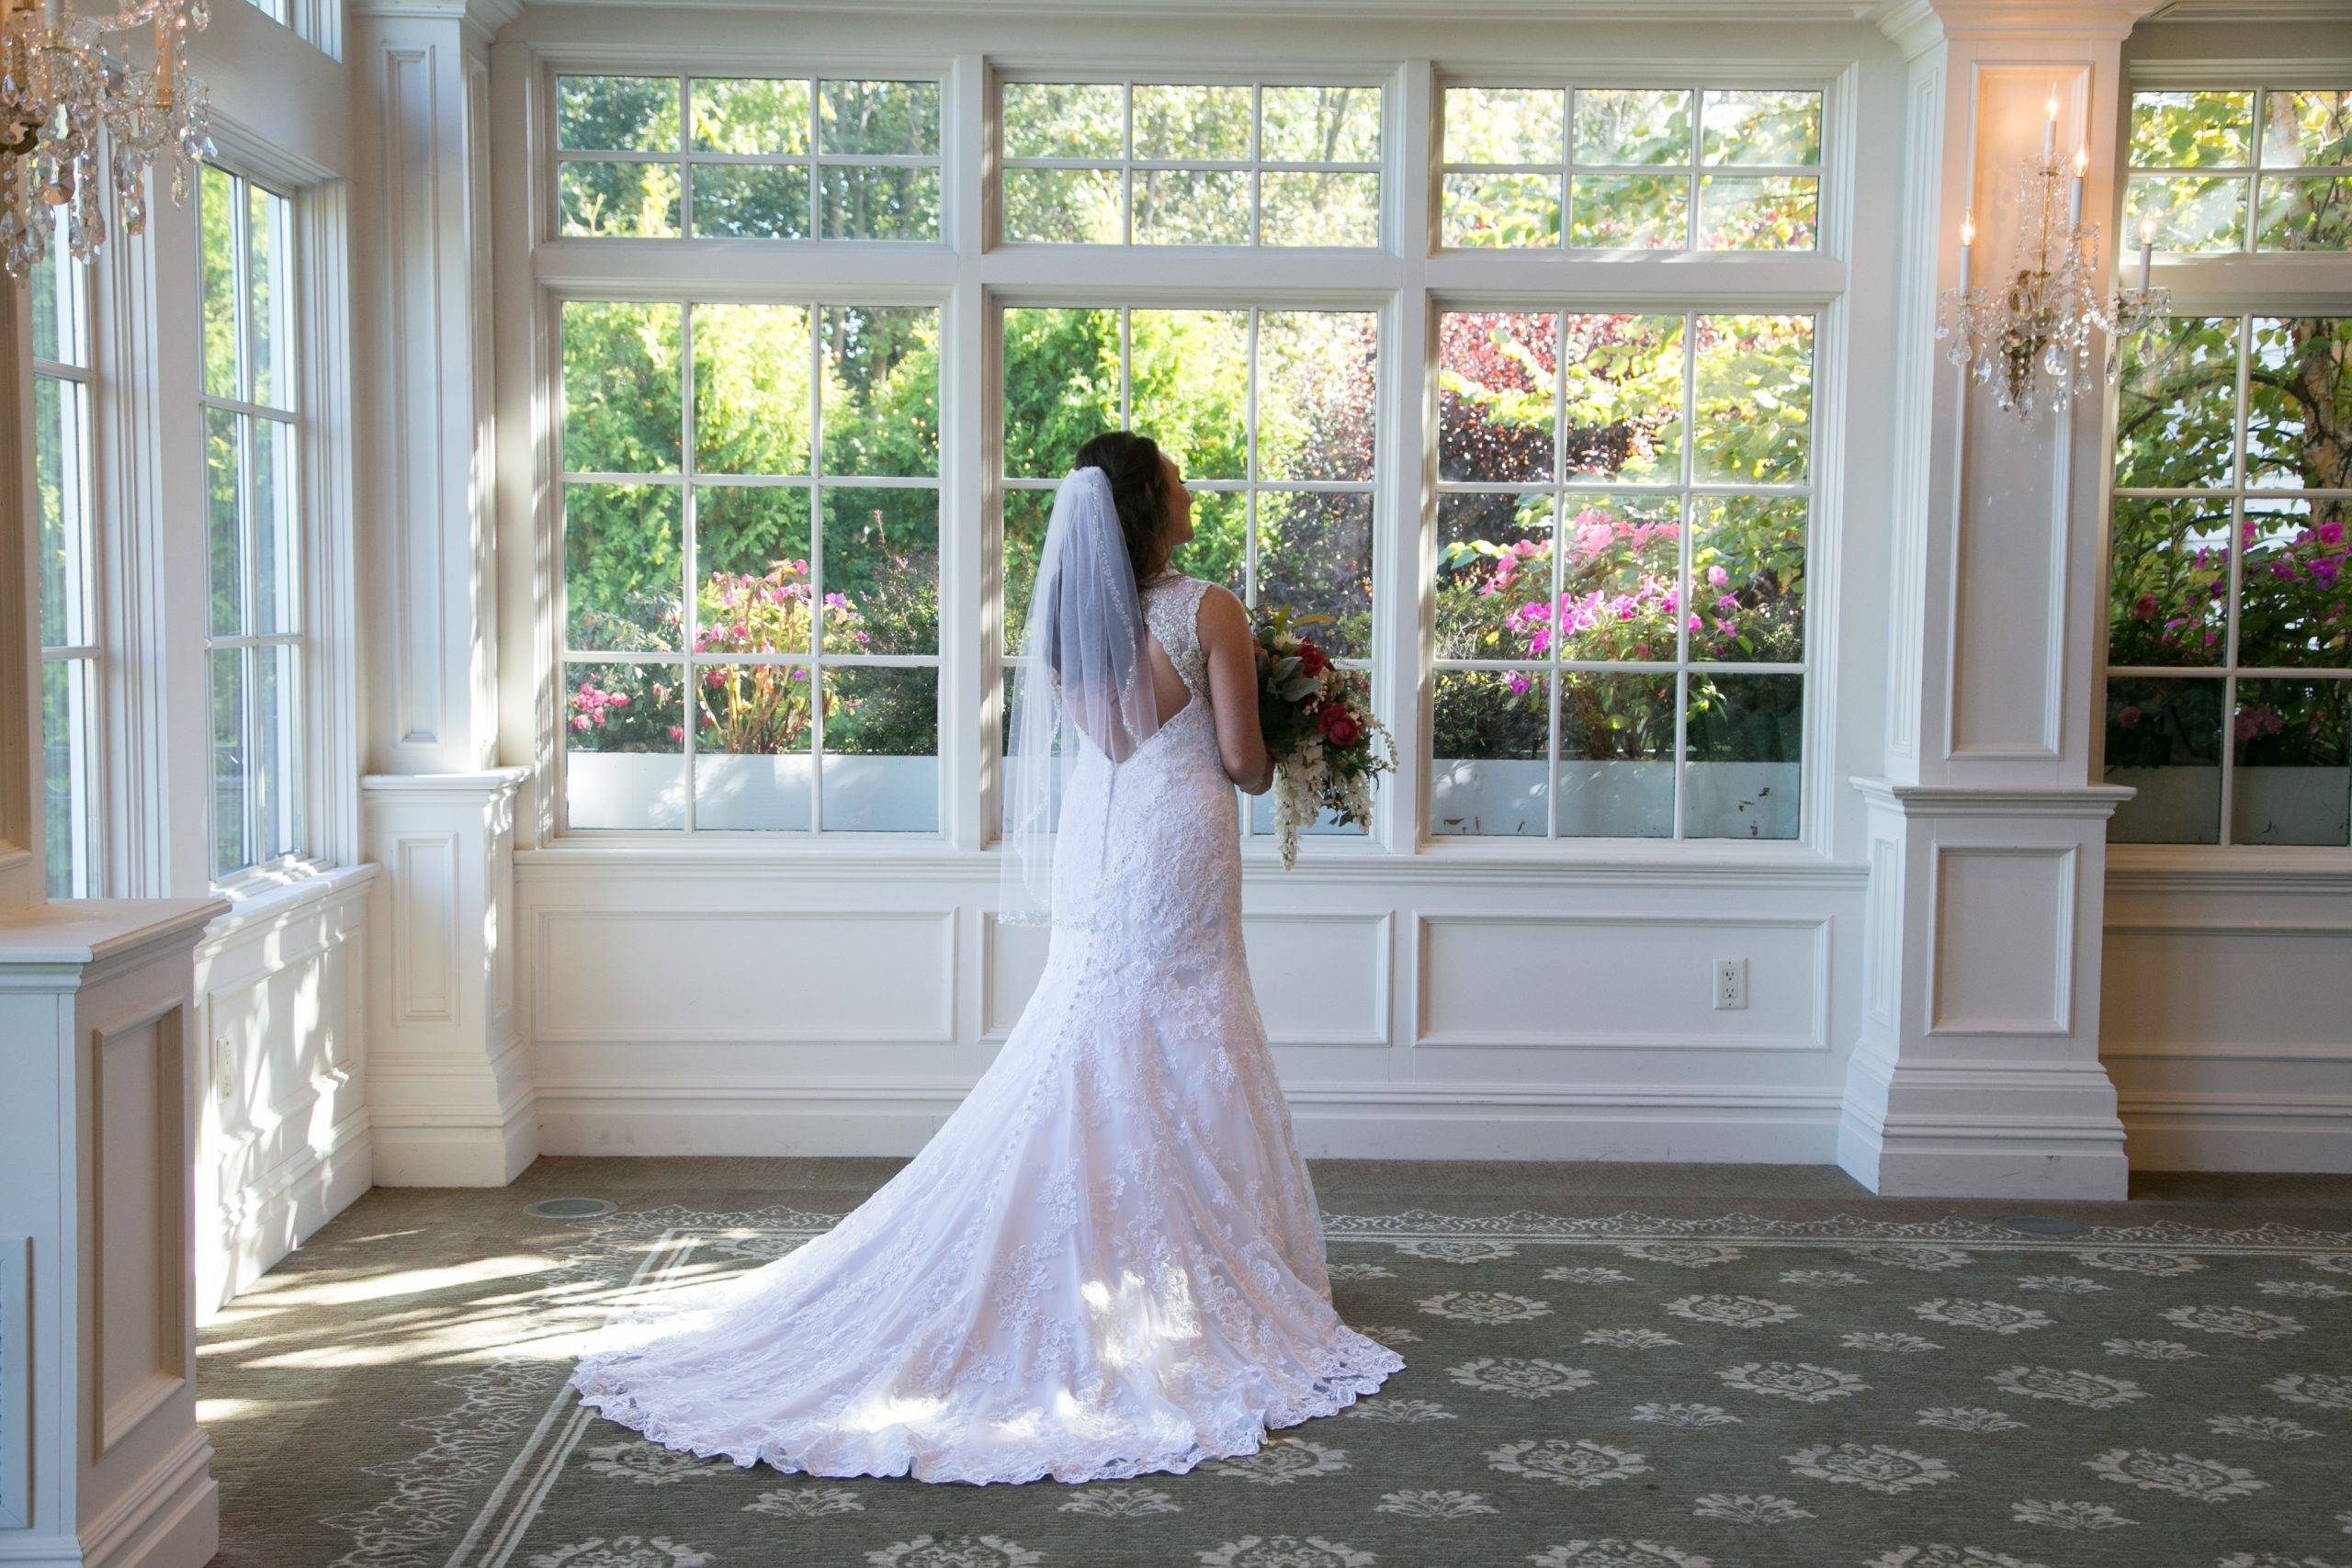 Park Savoy bride ready for her wedding